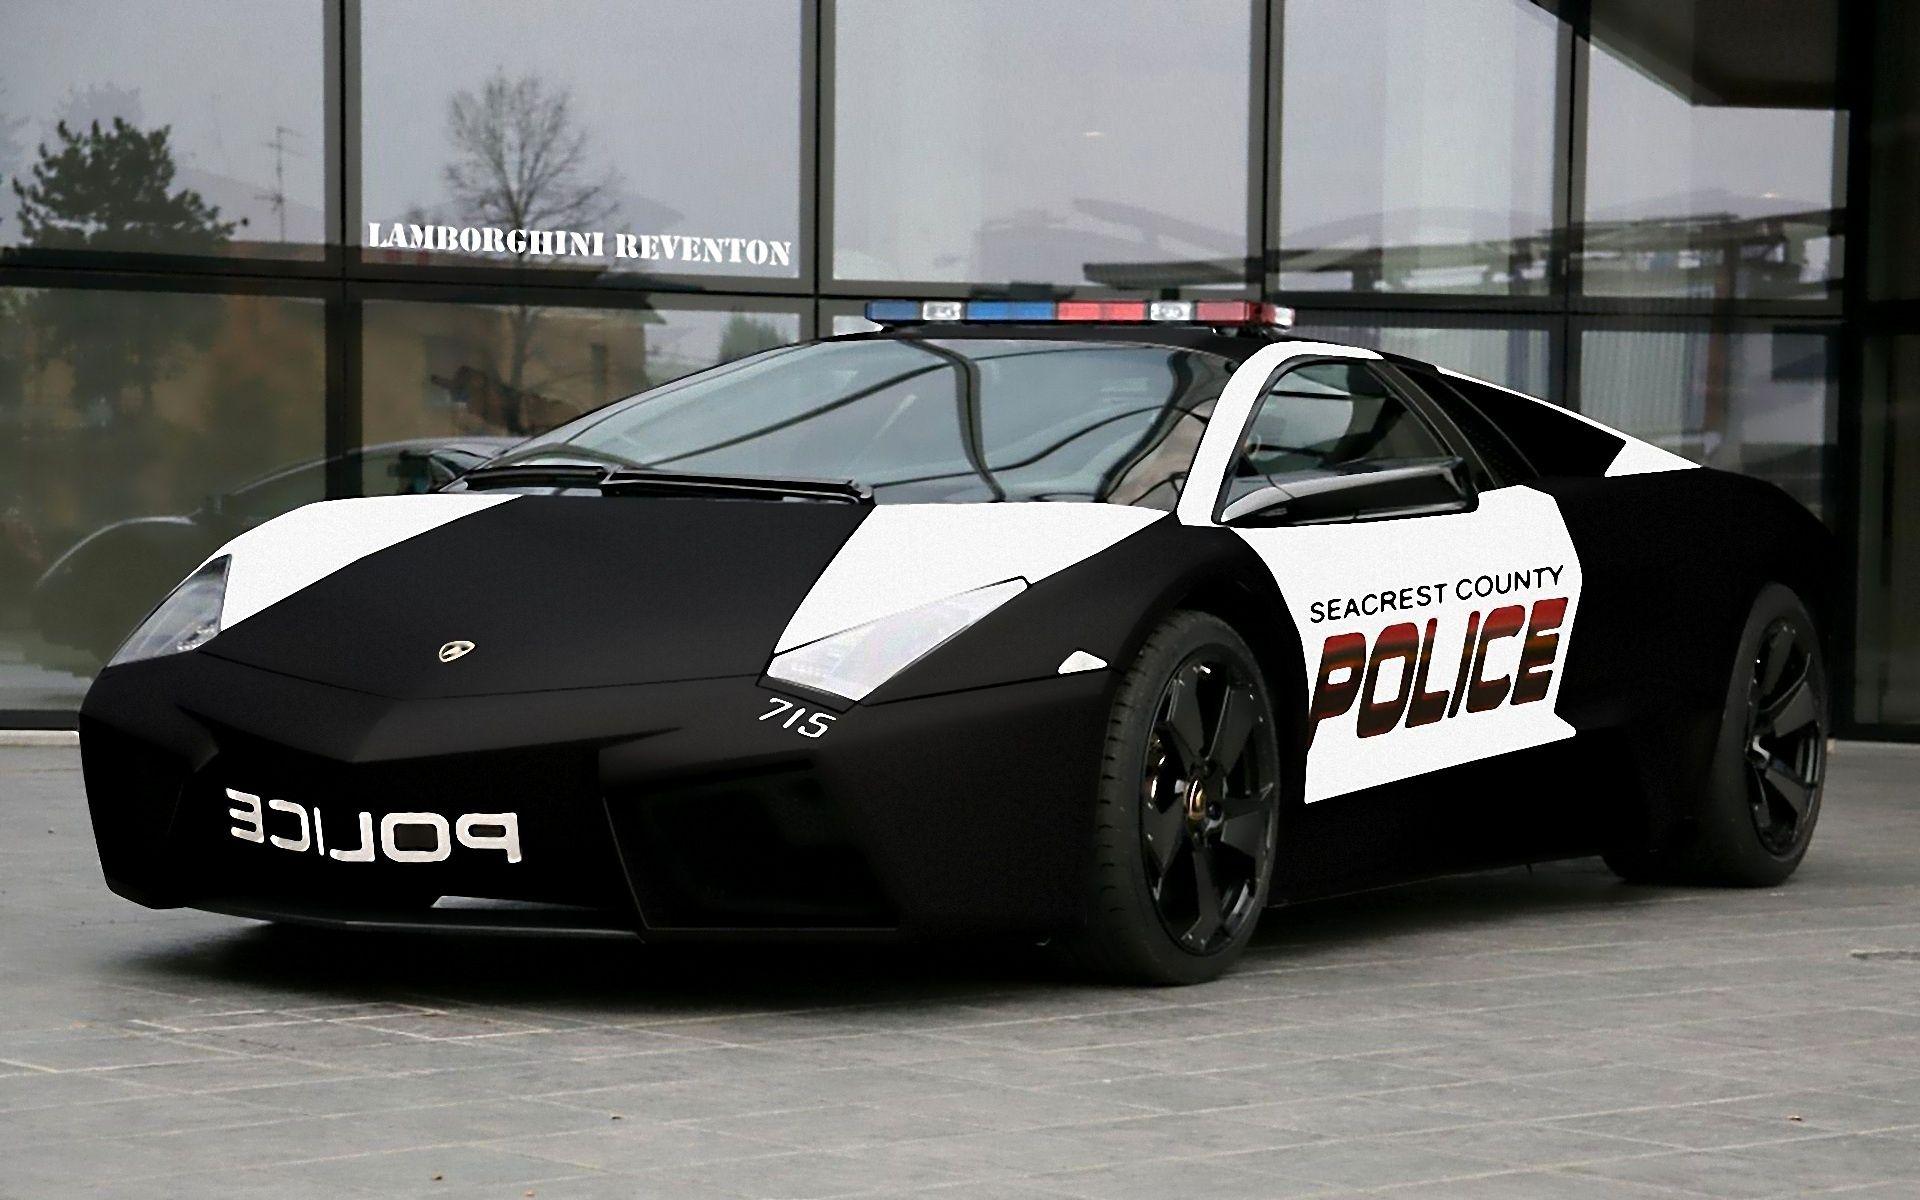 I Hope There S No Dept In The Us That Uses A Lamborghini For A Patrol Vehicle Police Cars Lamborghini Pictures Lamborghini